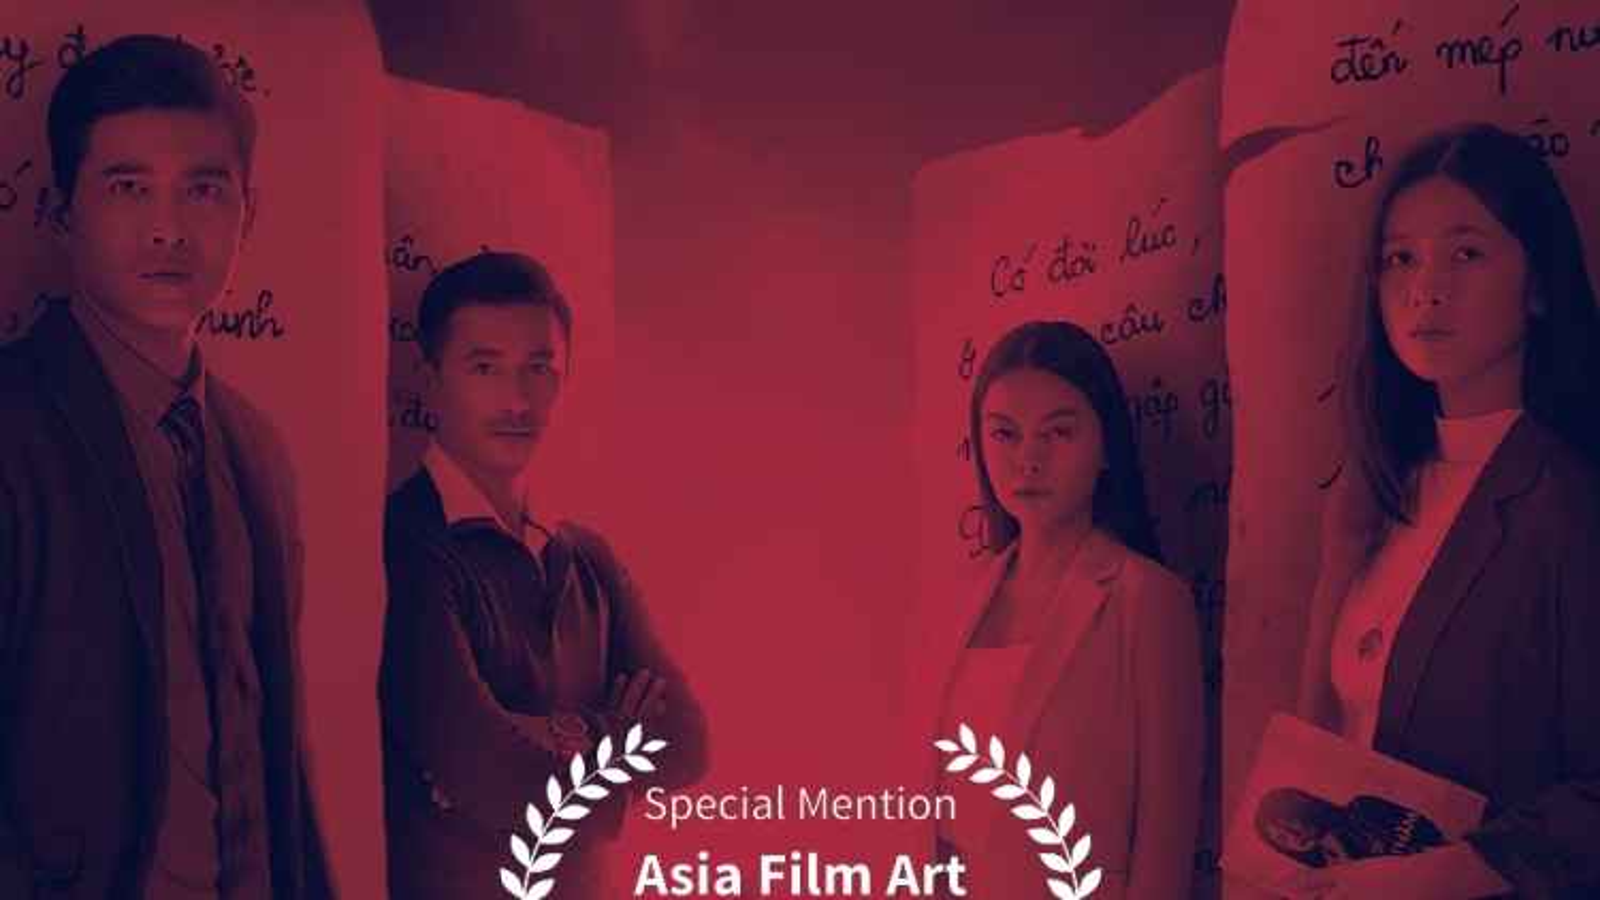 Local horror film wins three awards at Asian film art festival